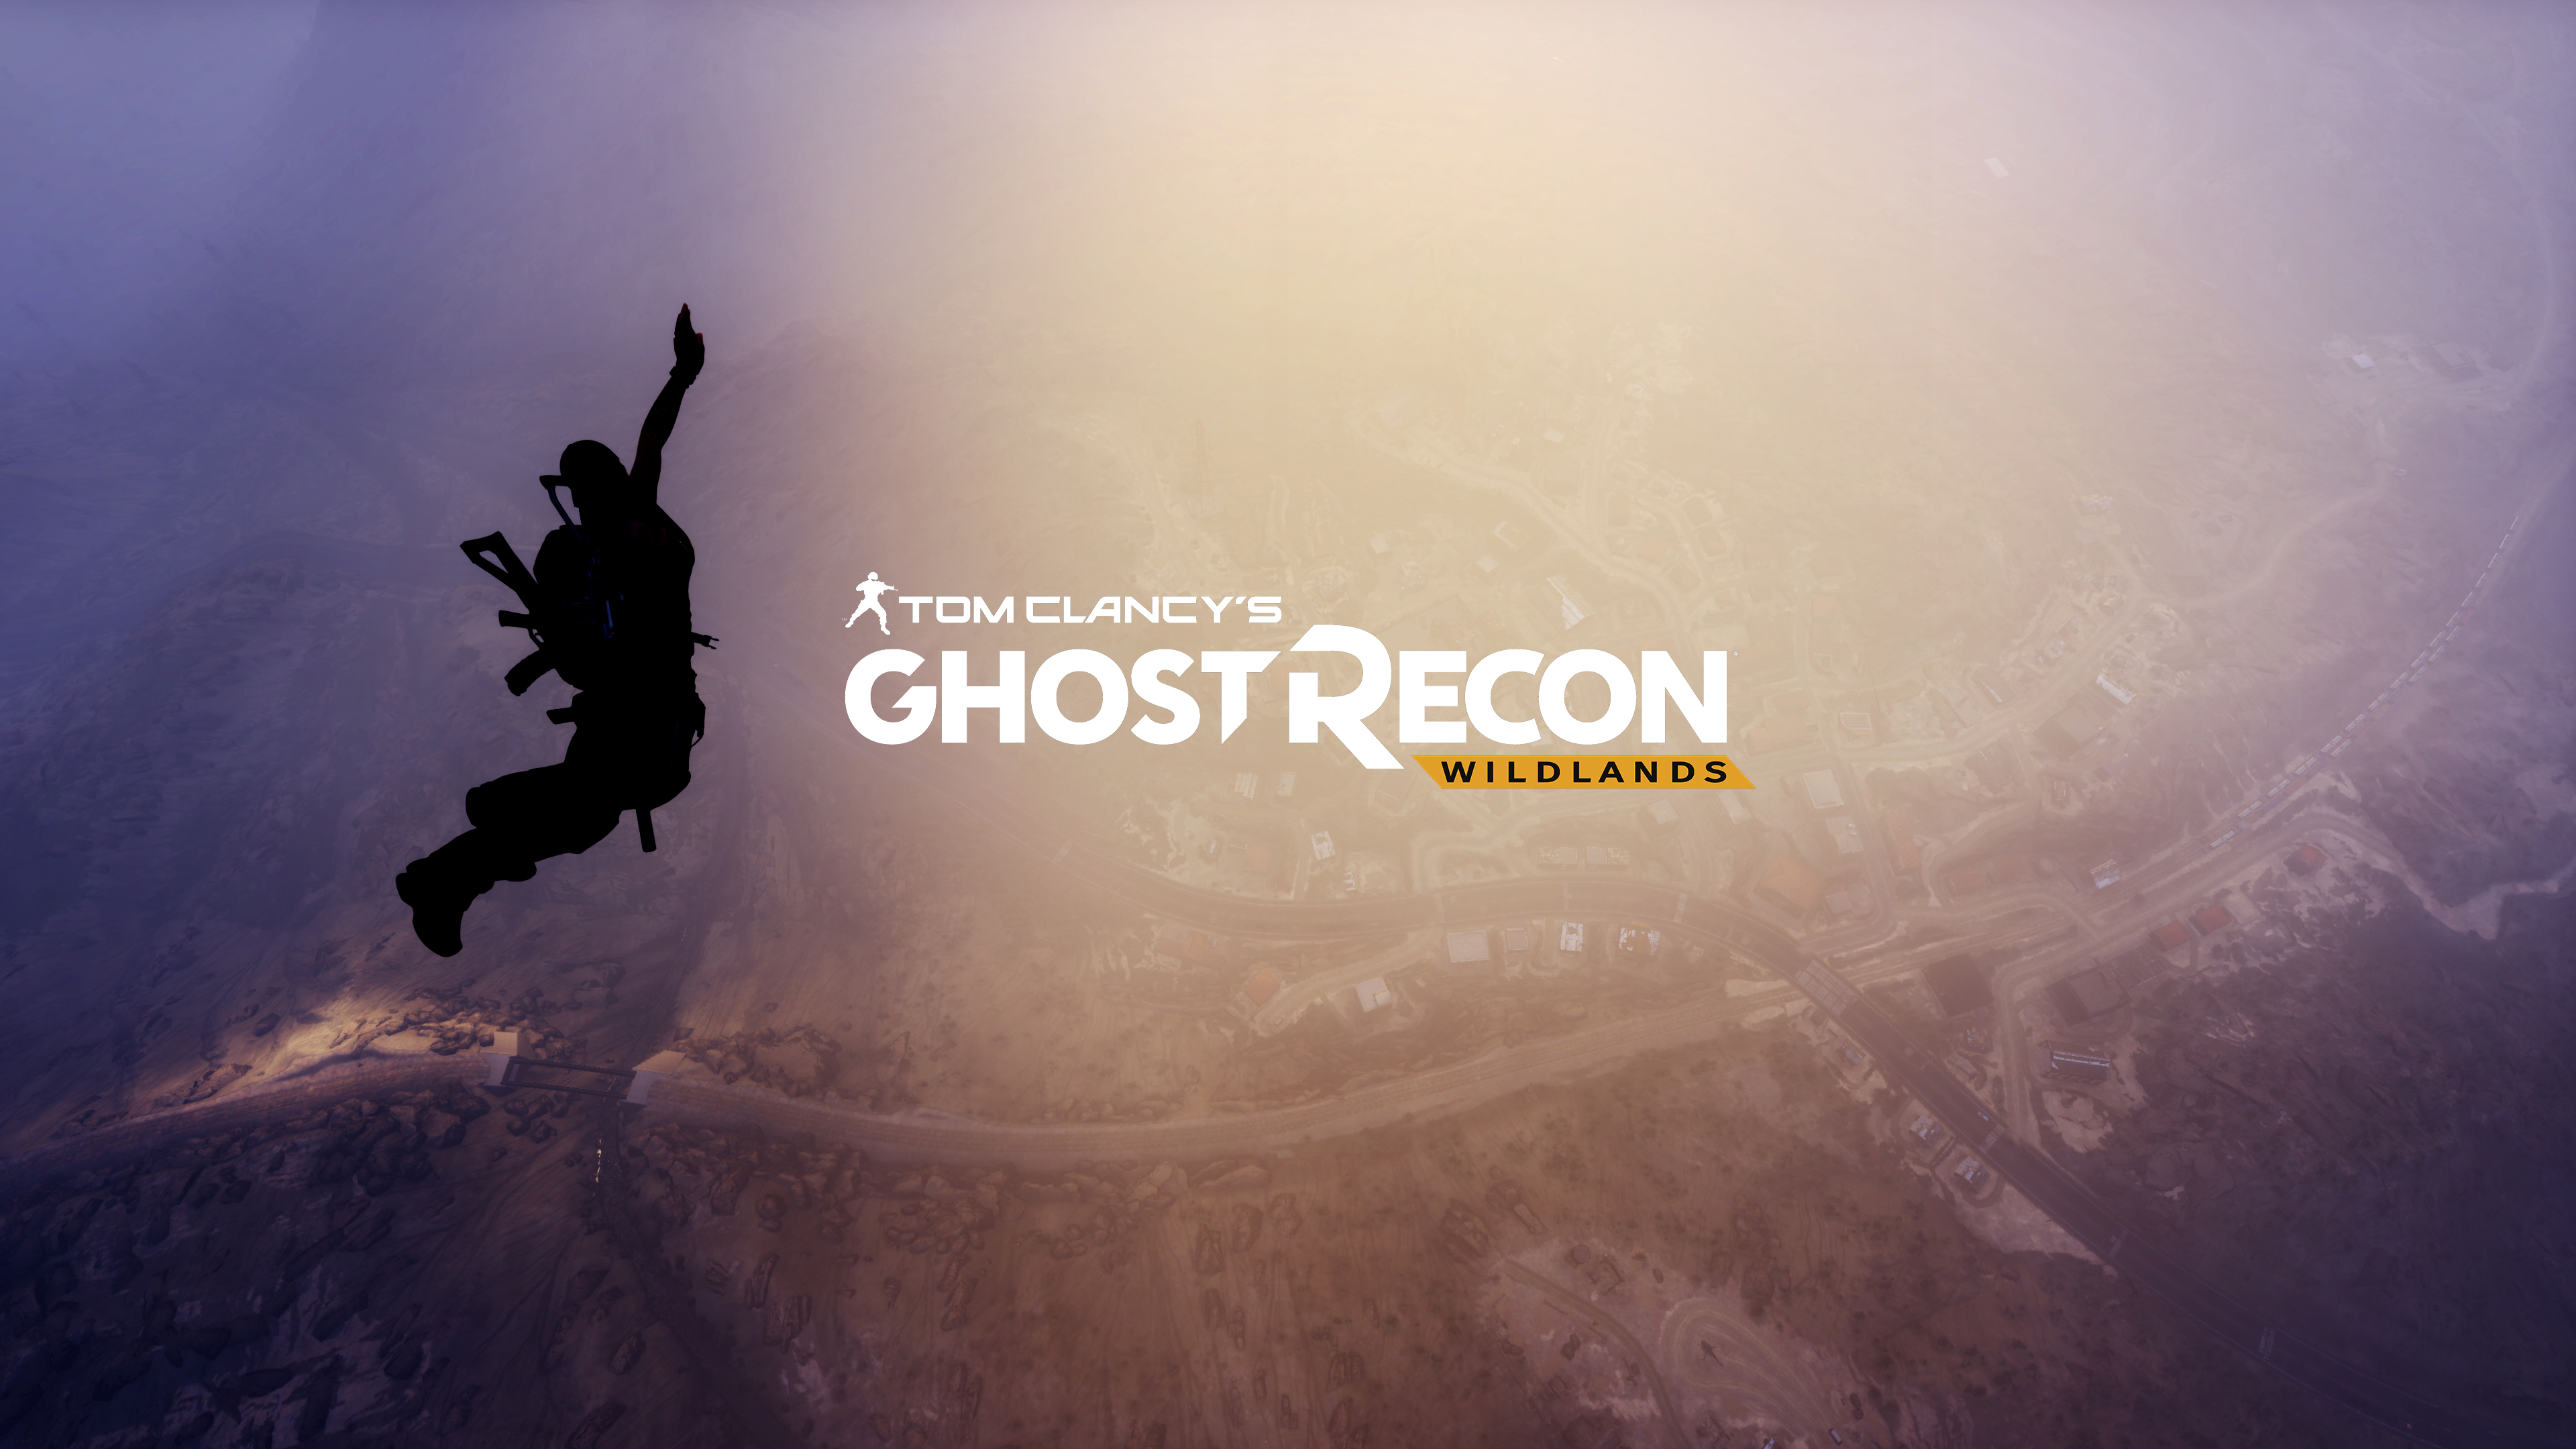 720x1280 Tom Clancys Ghost Recon Wildlands 4k Logo Moto G